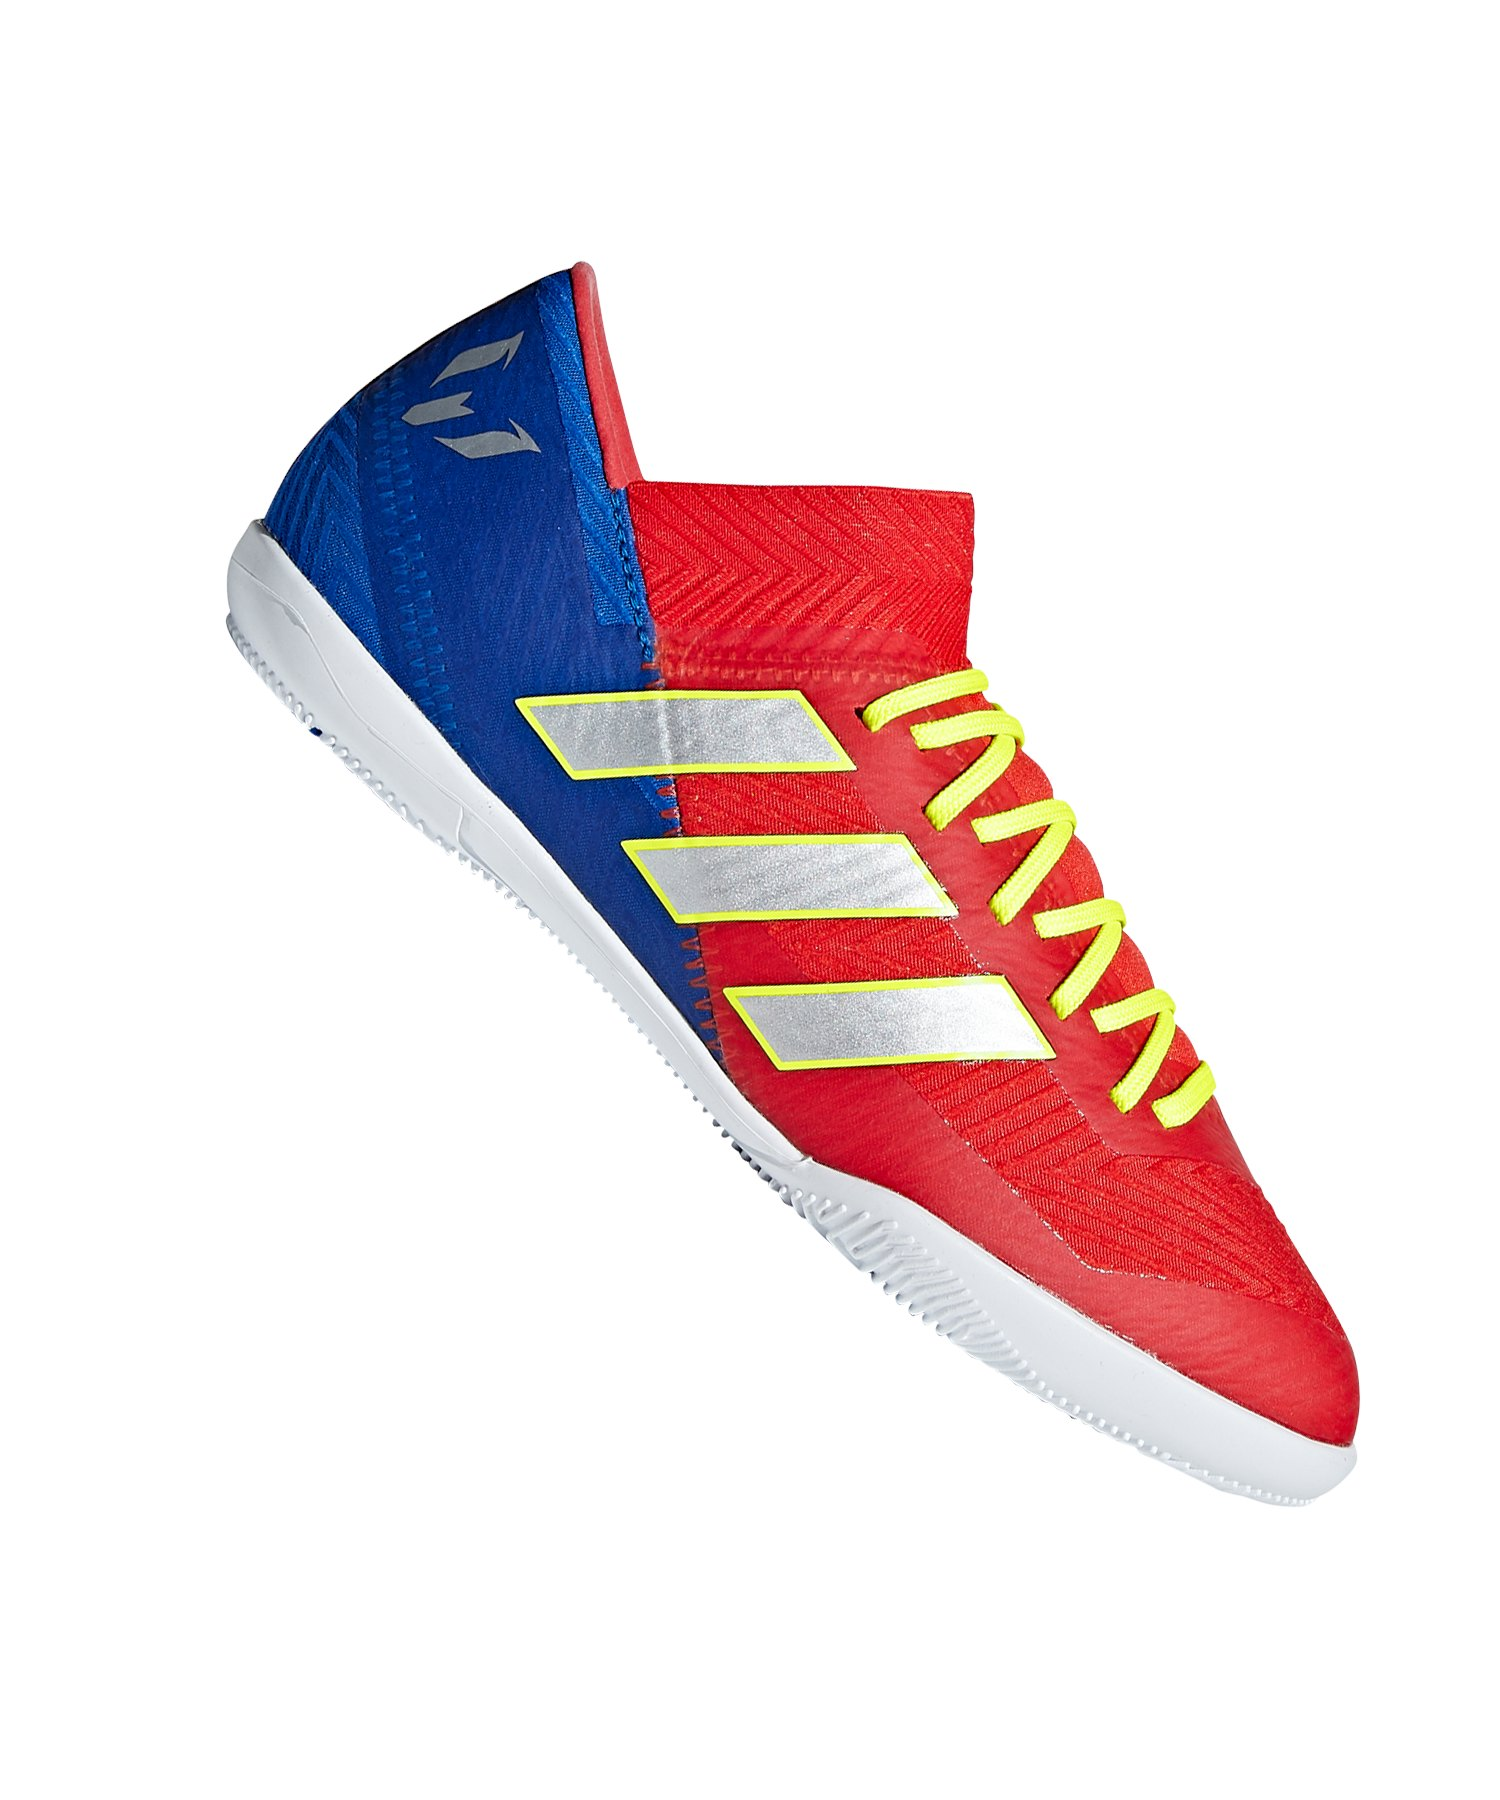 adidas NEMEZIZ Messi 18.3 IN Halle Kids Rot Blau - rot